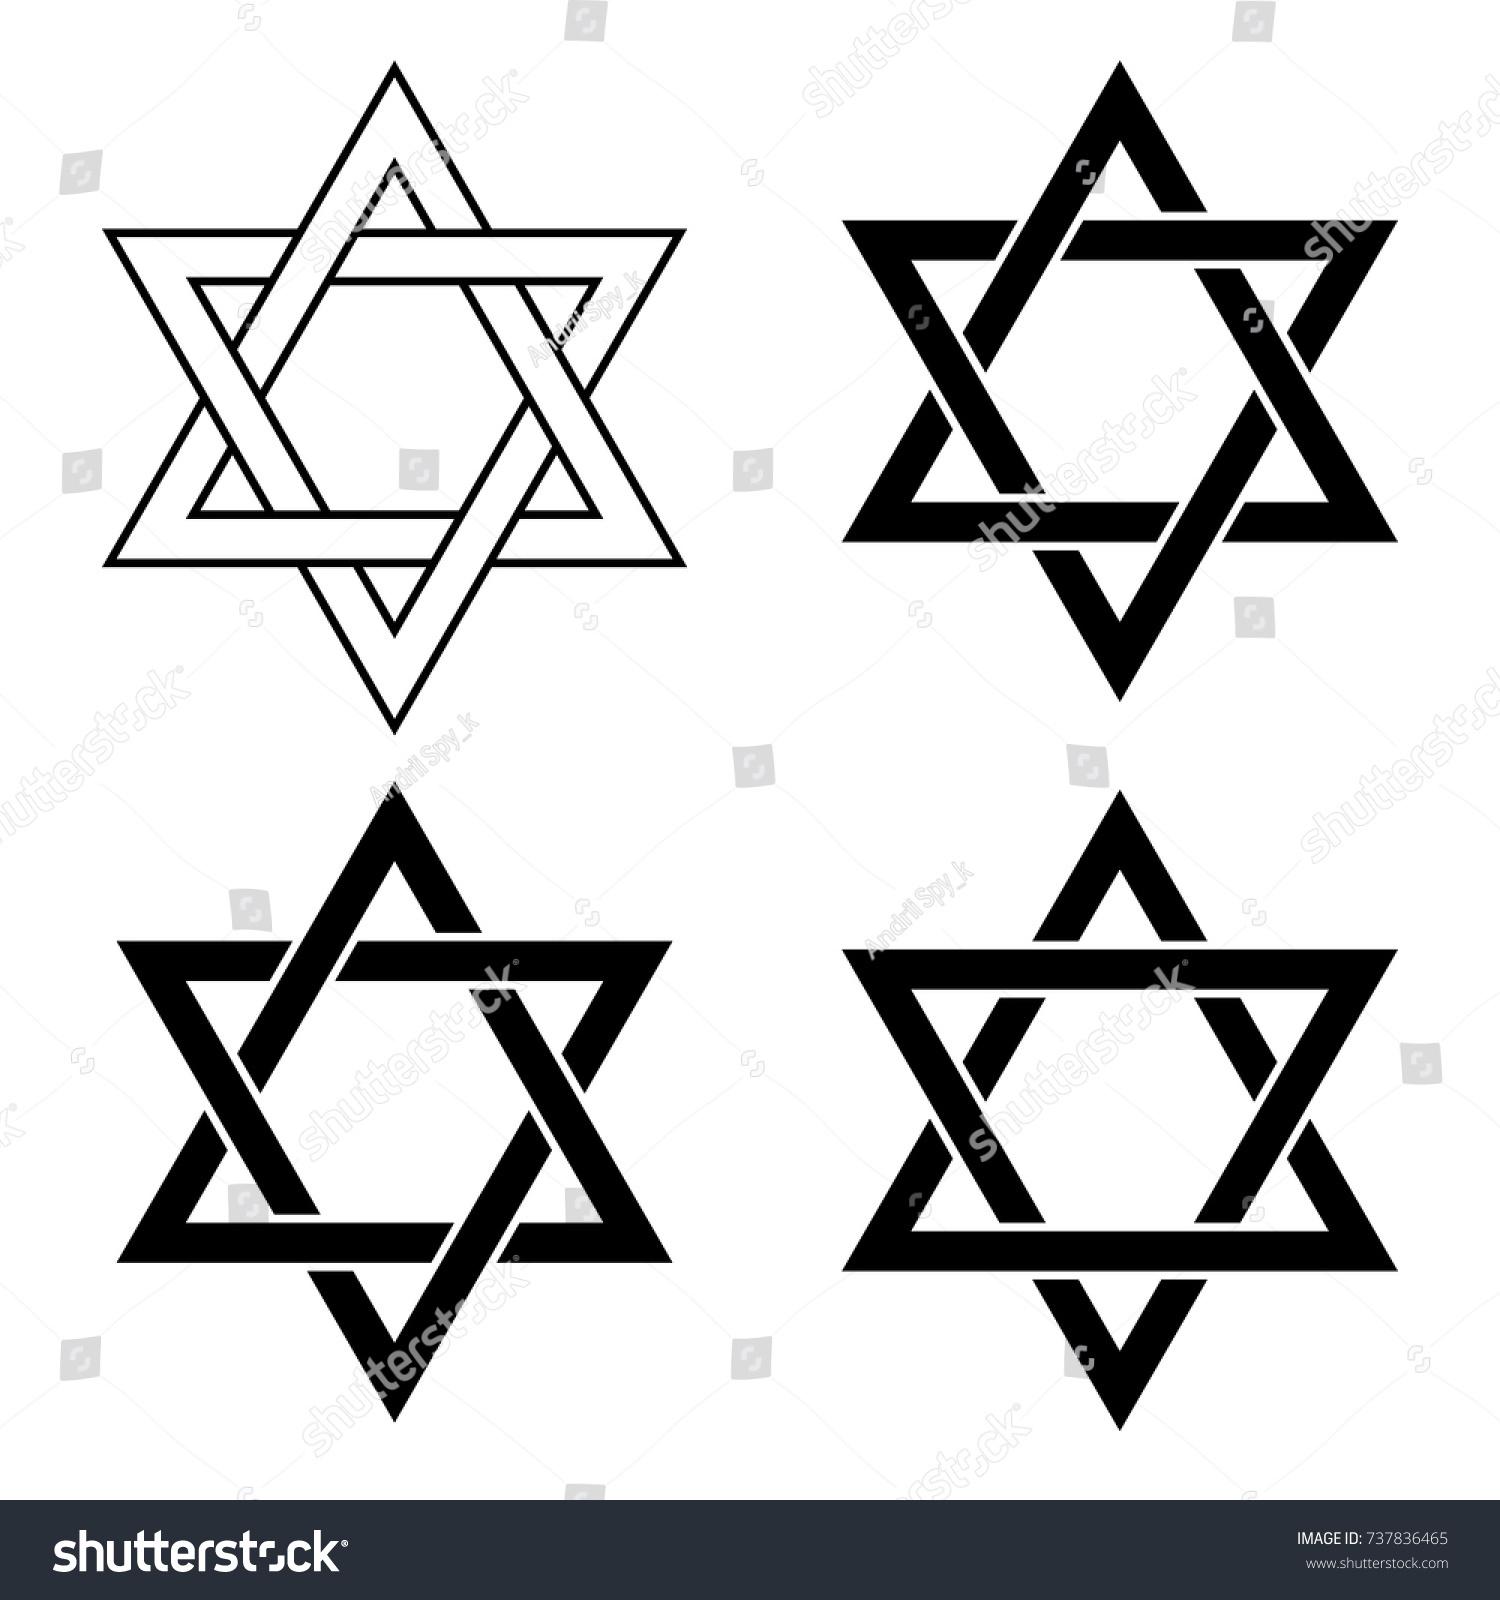 Ancient star symbols image collections symbol and sign ideas star david set icons vector illustration stock vector 737836465 star of david set icons vector illustration buycottarizona